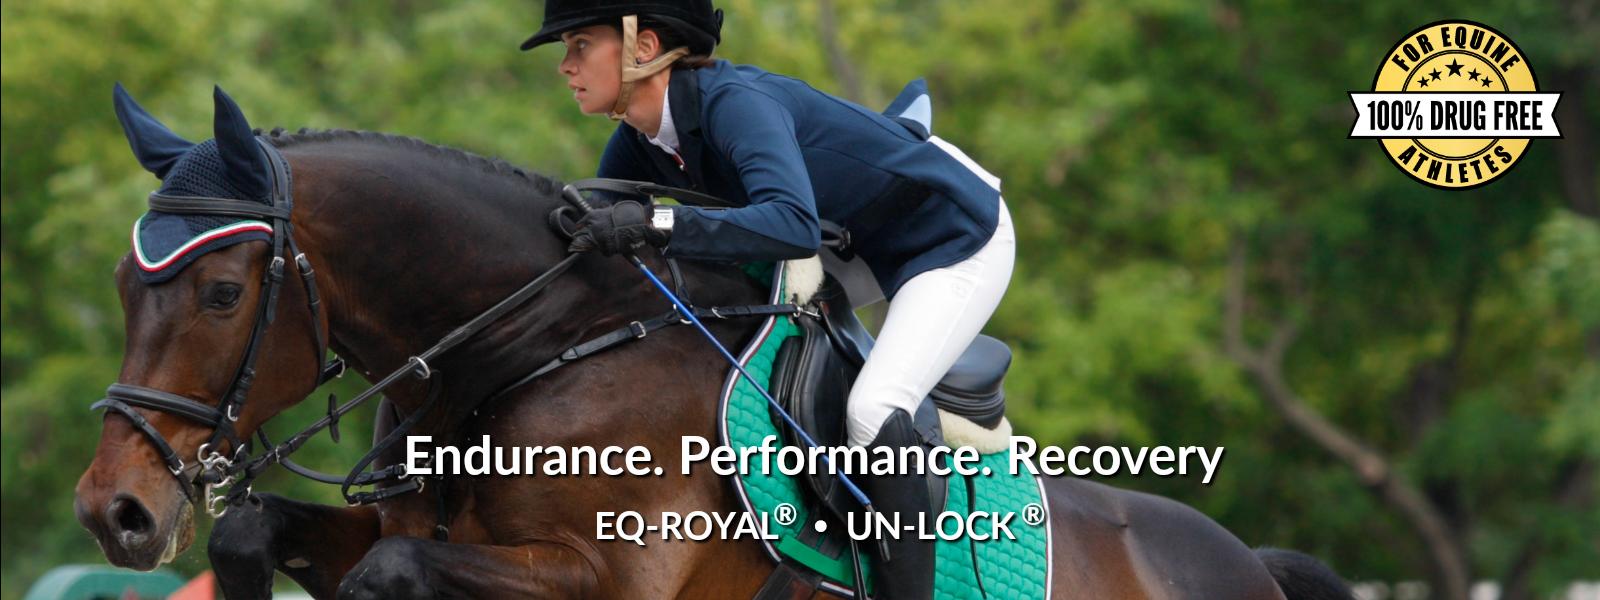 EQ-ROYAL and UN-Lock horse supplements